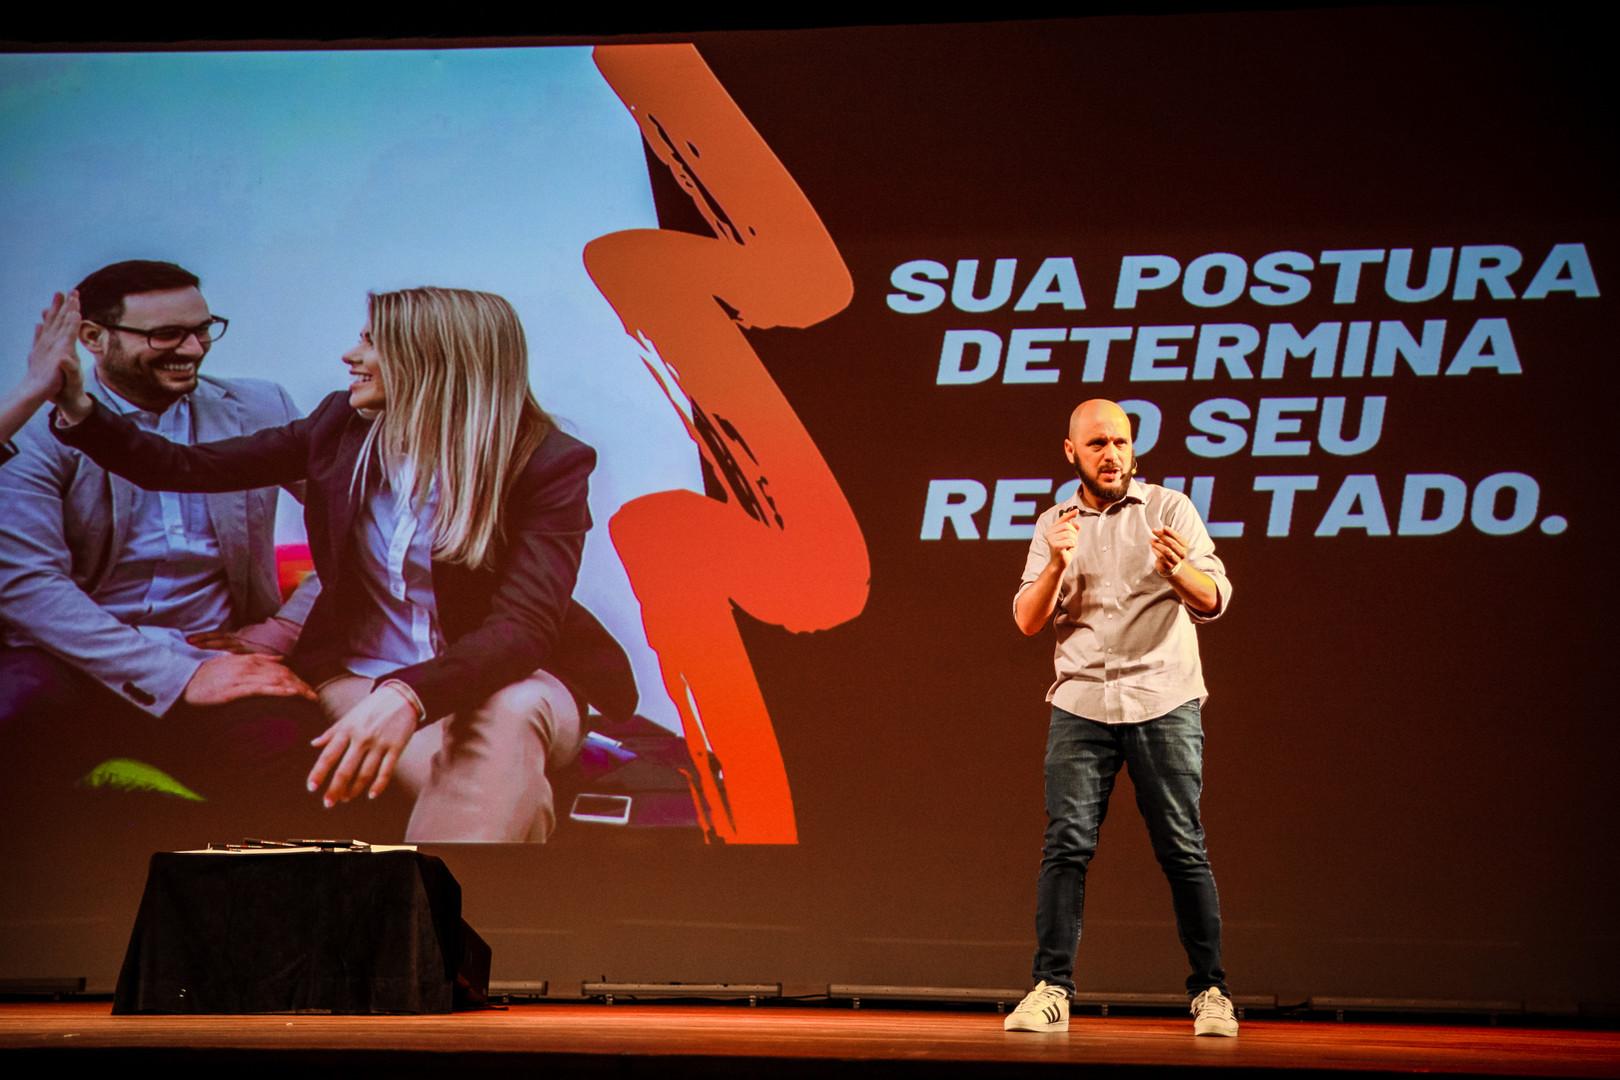 Diego-Maia-Melhor-Palestrante.jpg